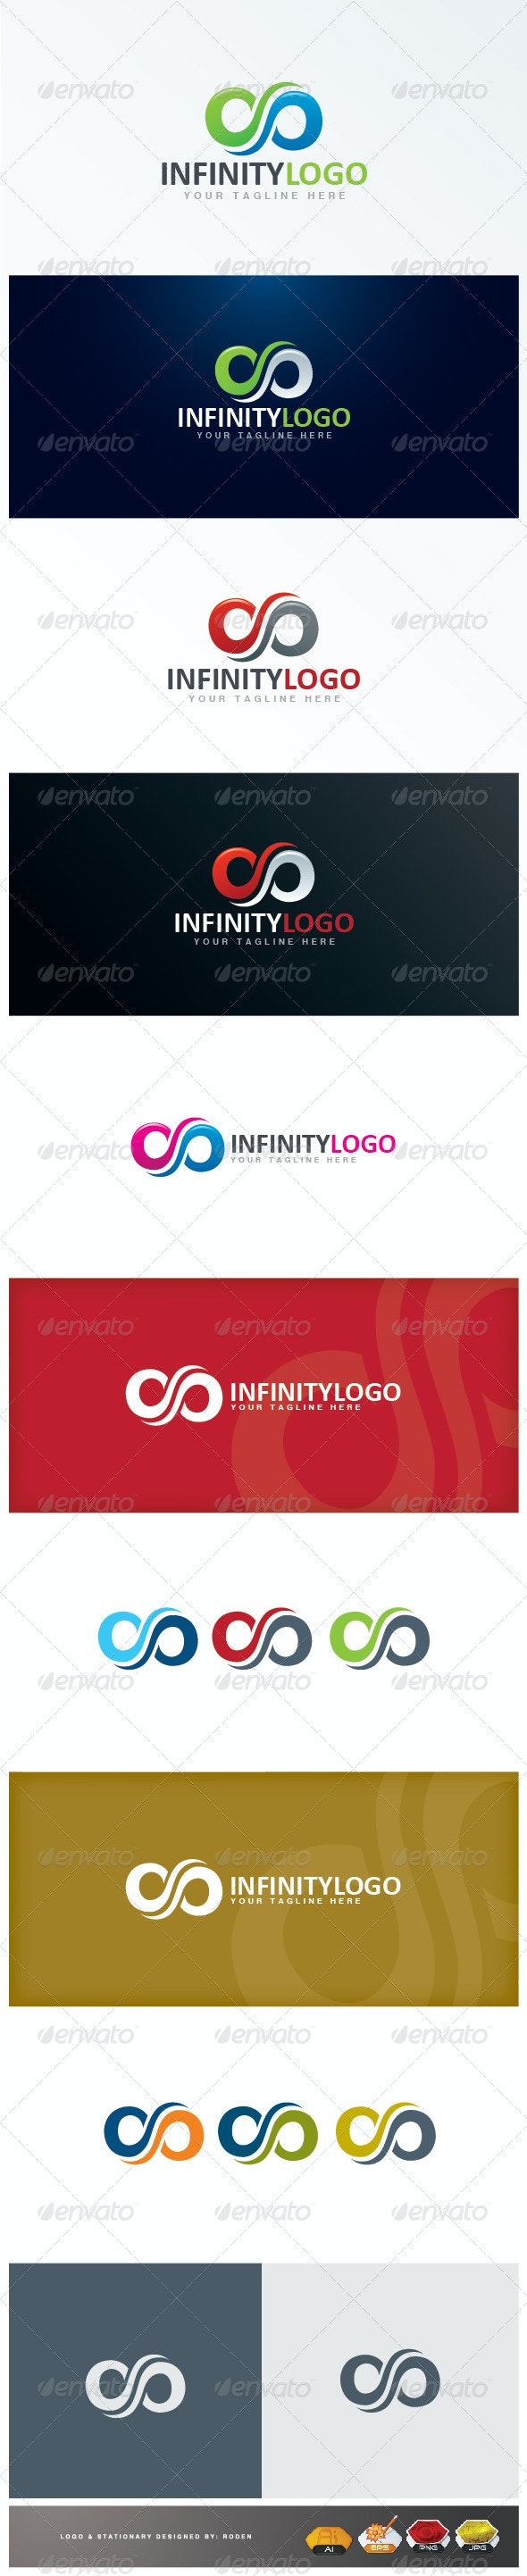 Infinity logo - Logo Templates